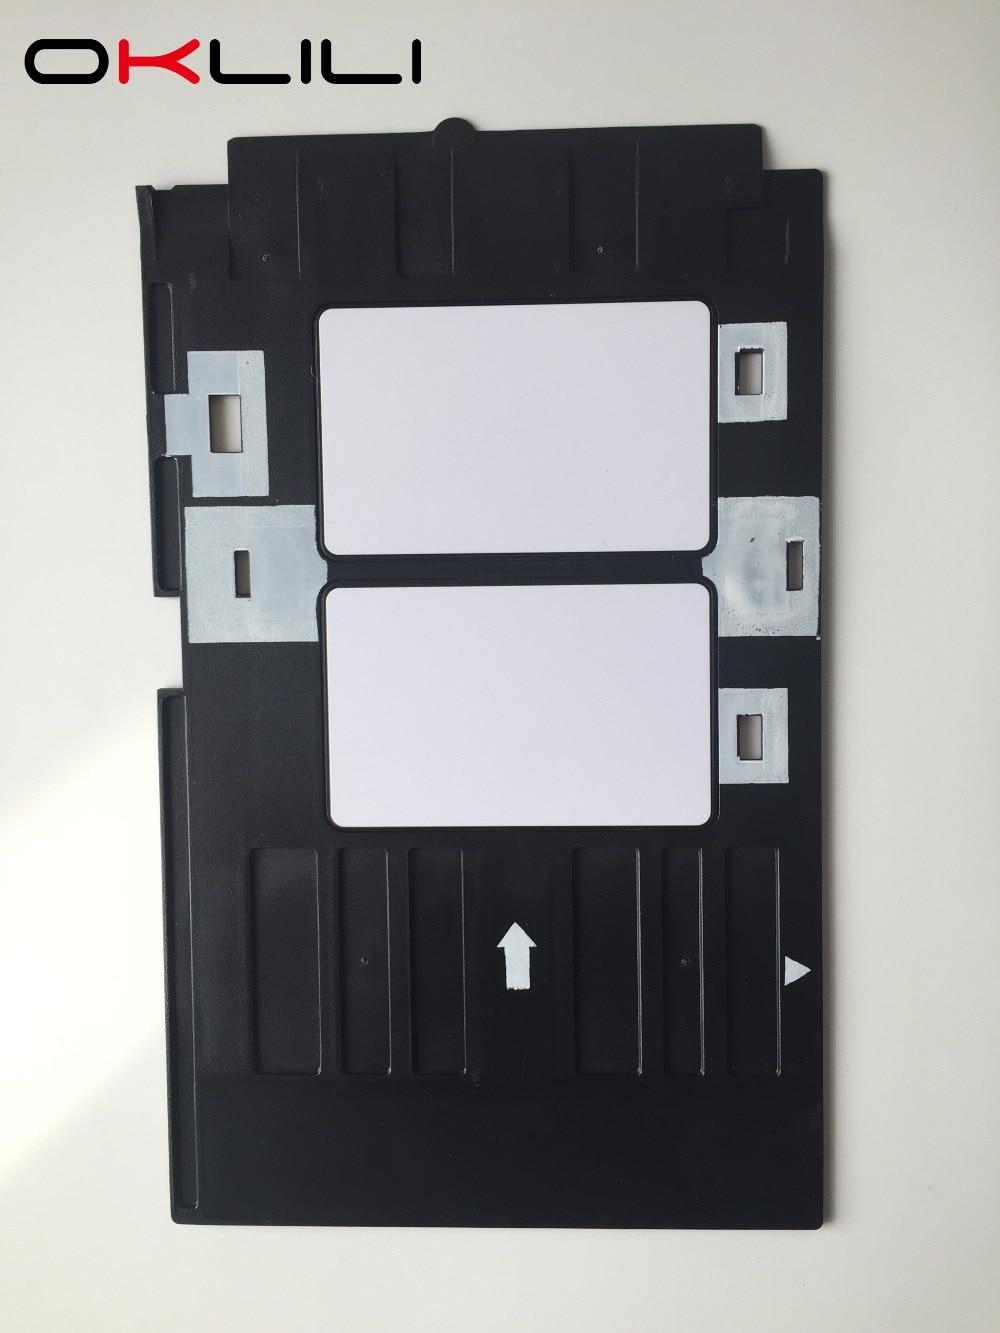 PVC ID Card Tray Plastic card Printing Dulang untuk Epson R260 R265 R270 R280 R290 R380 R390 RX680 T50 T60 A50 P50 L800 L801 R330